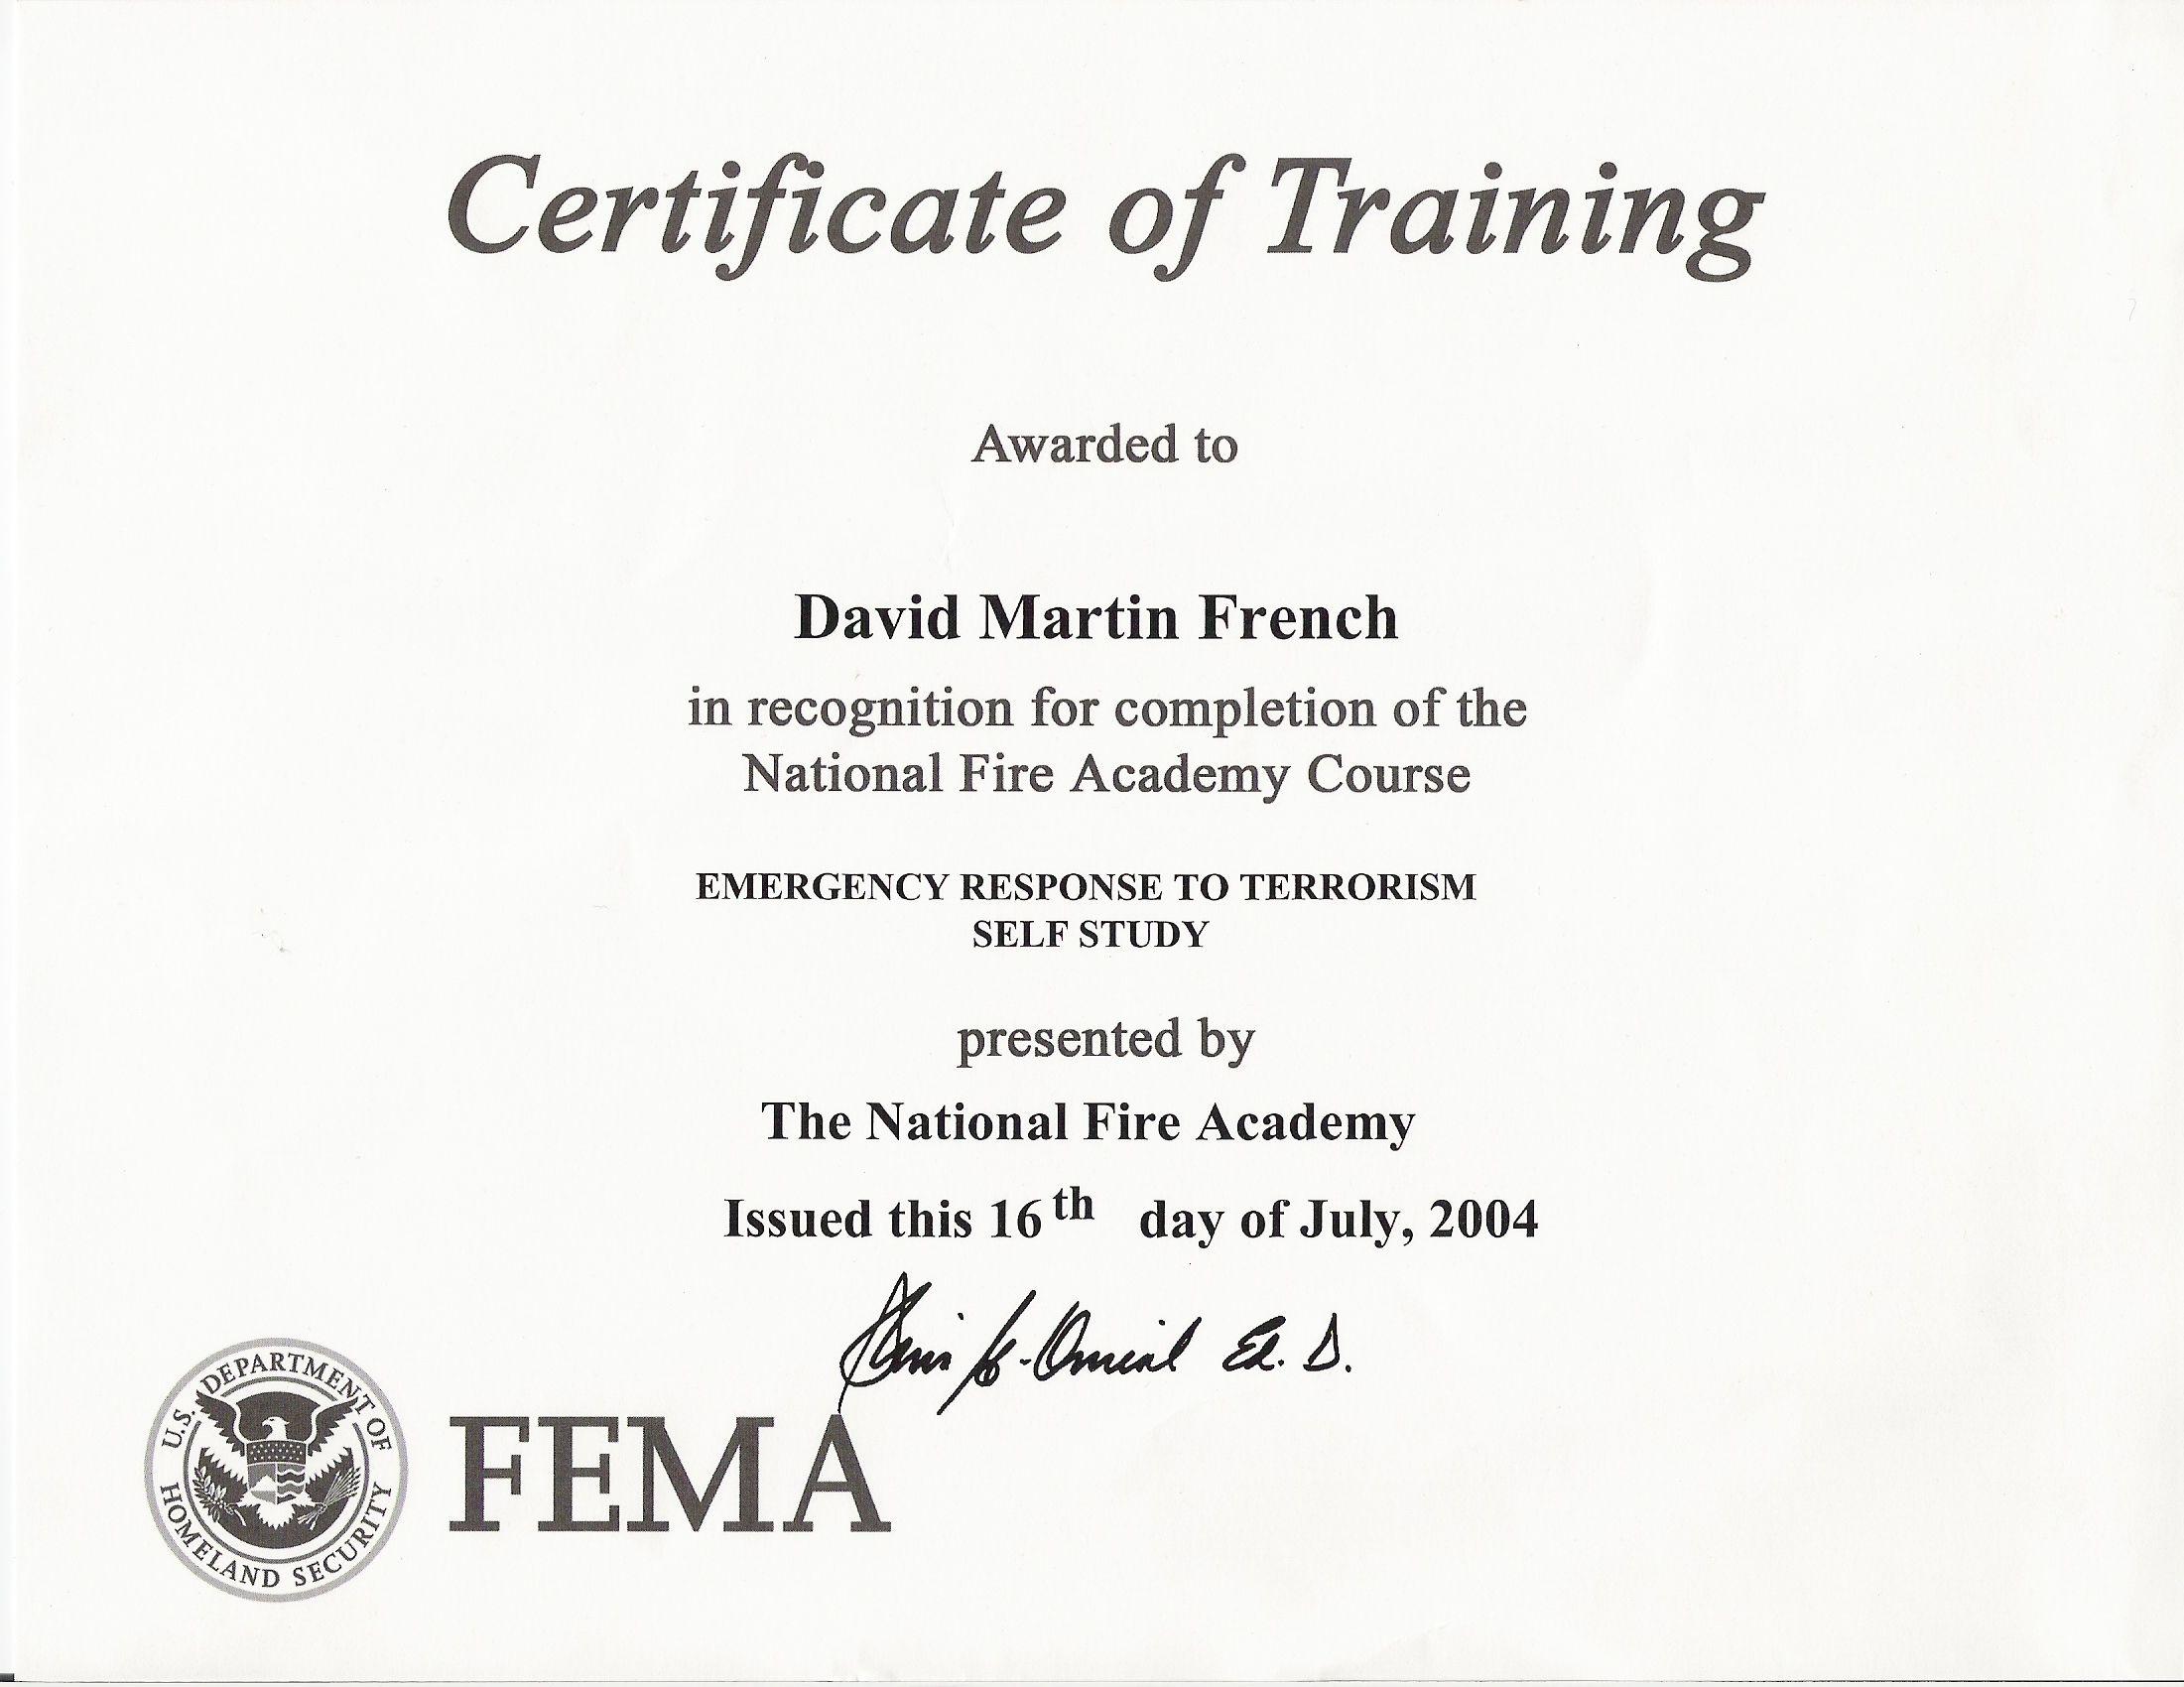 emergency response to terrorism fema certificates